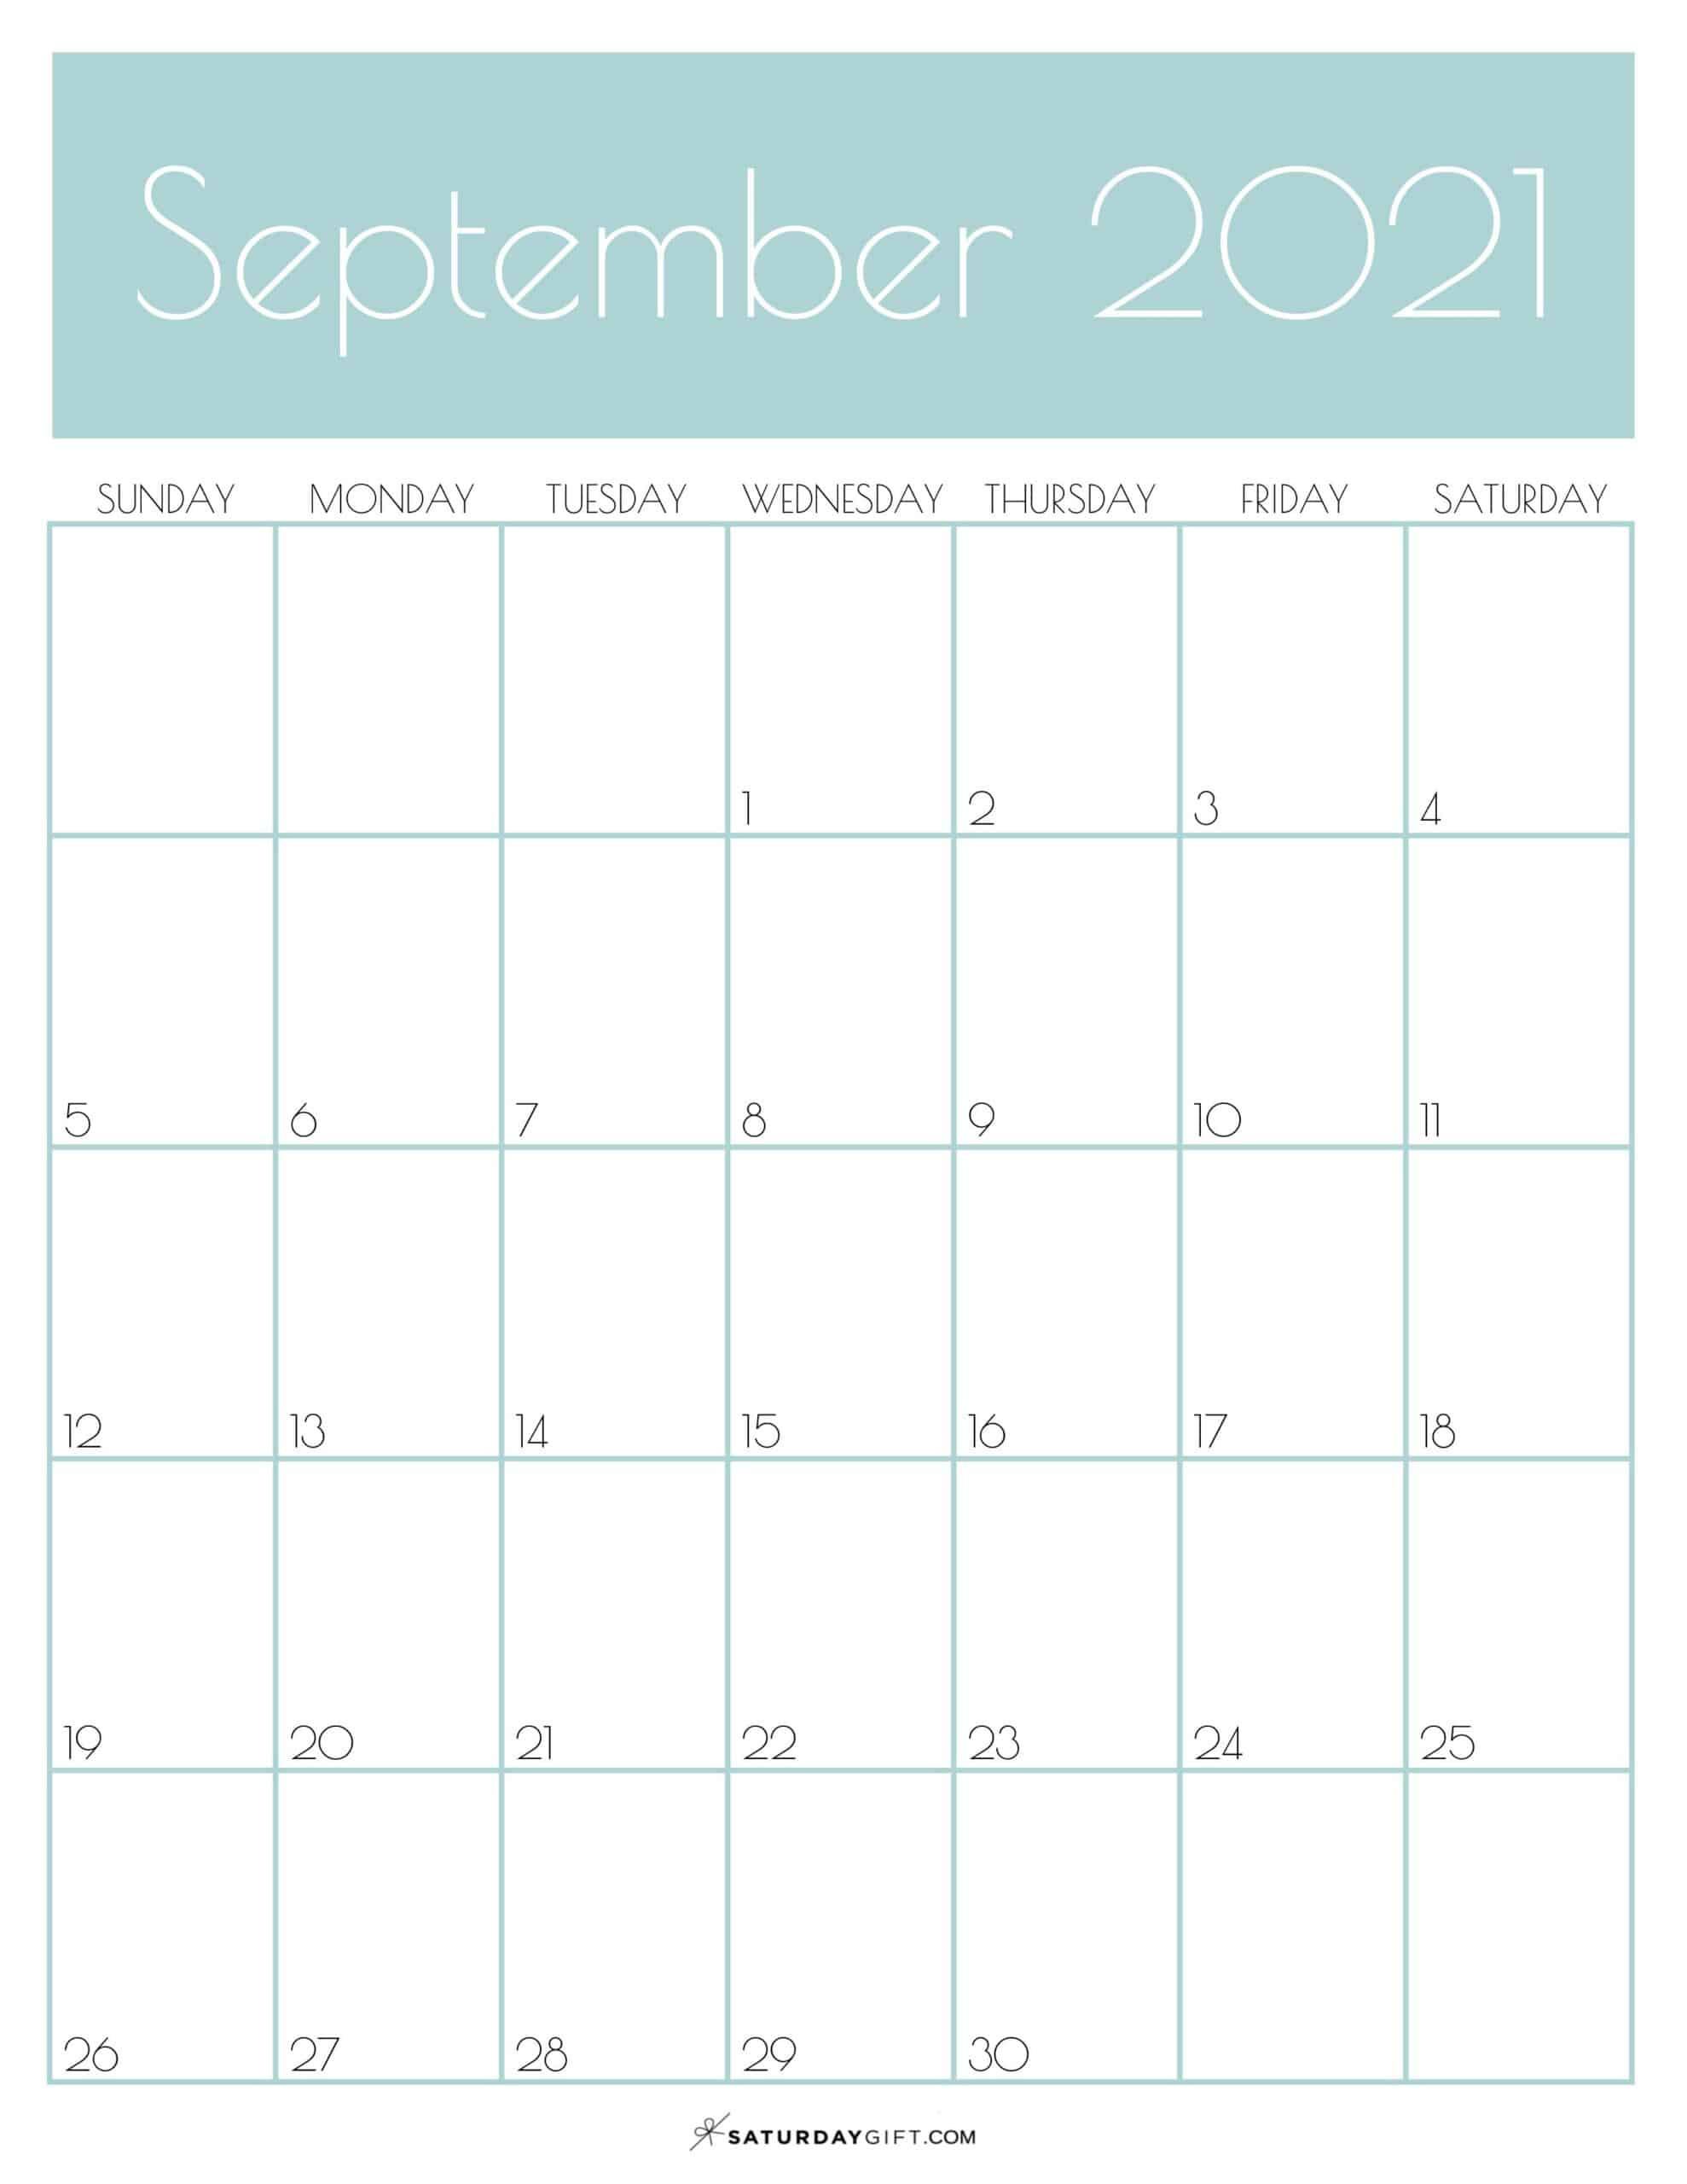 Cute (& Free!) Printable September 2021 Calendar-Calendar 2021 Sat Thru Sunday